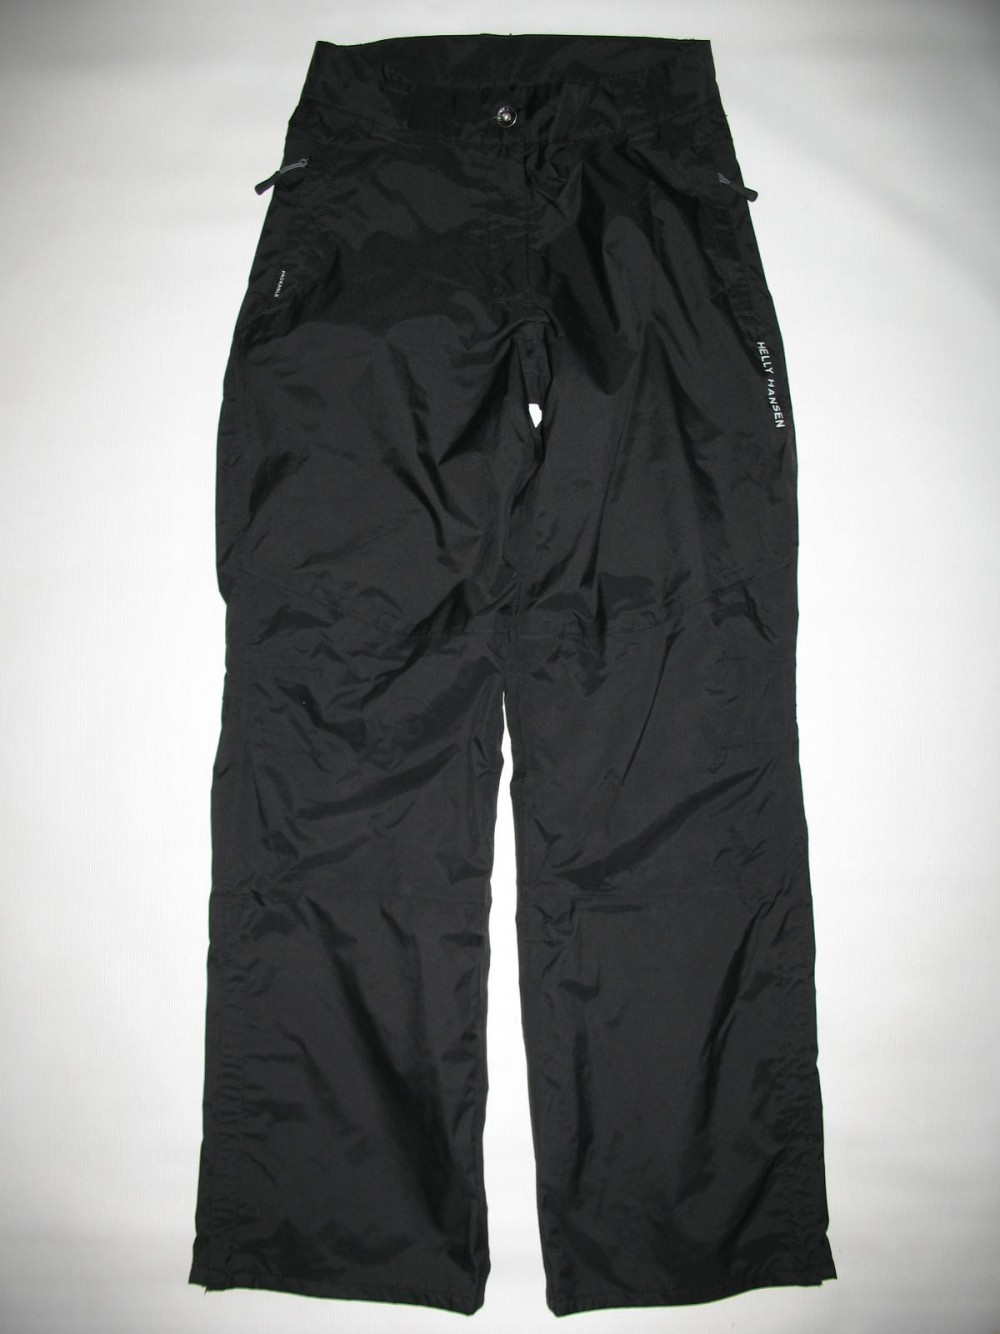 Штаны HELLY HANSEN hellytech packable pants lady (размер XS) - 1